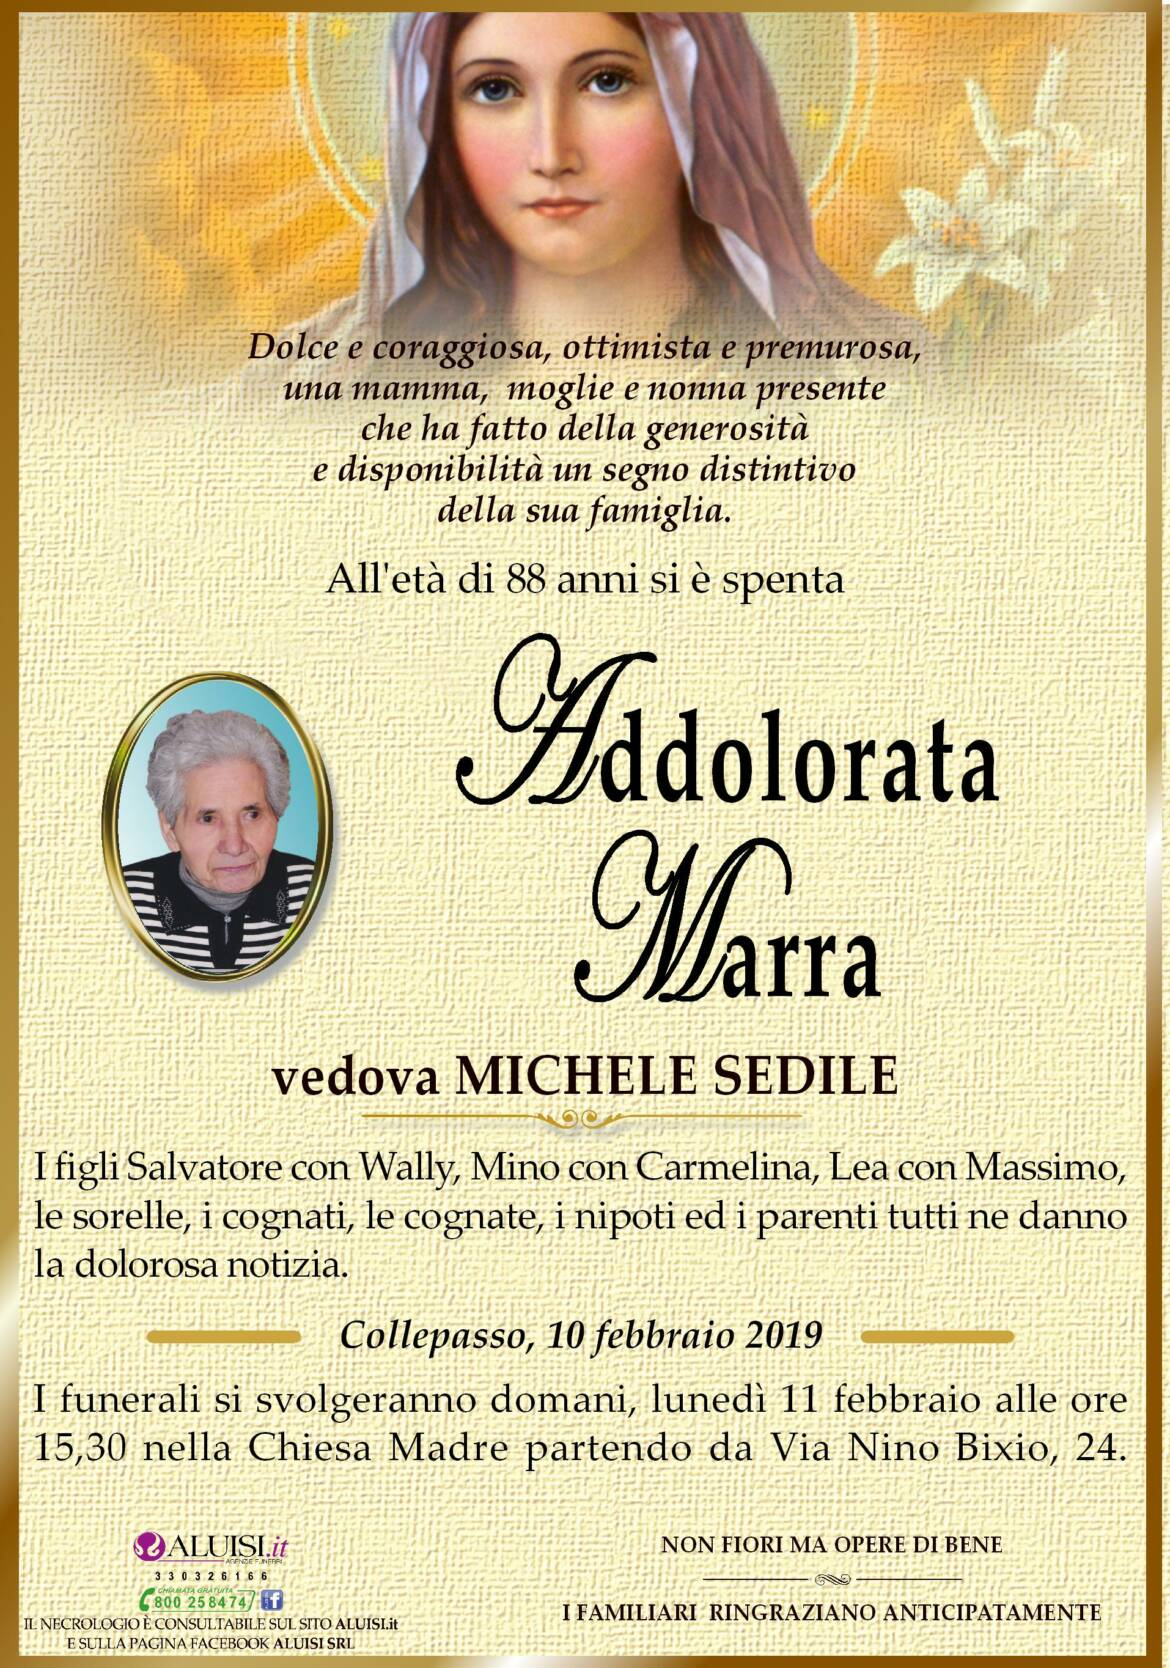 annuncio-ADDOLORATA-MARRA-fb.jpg